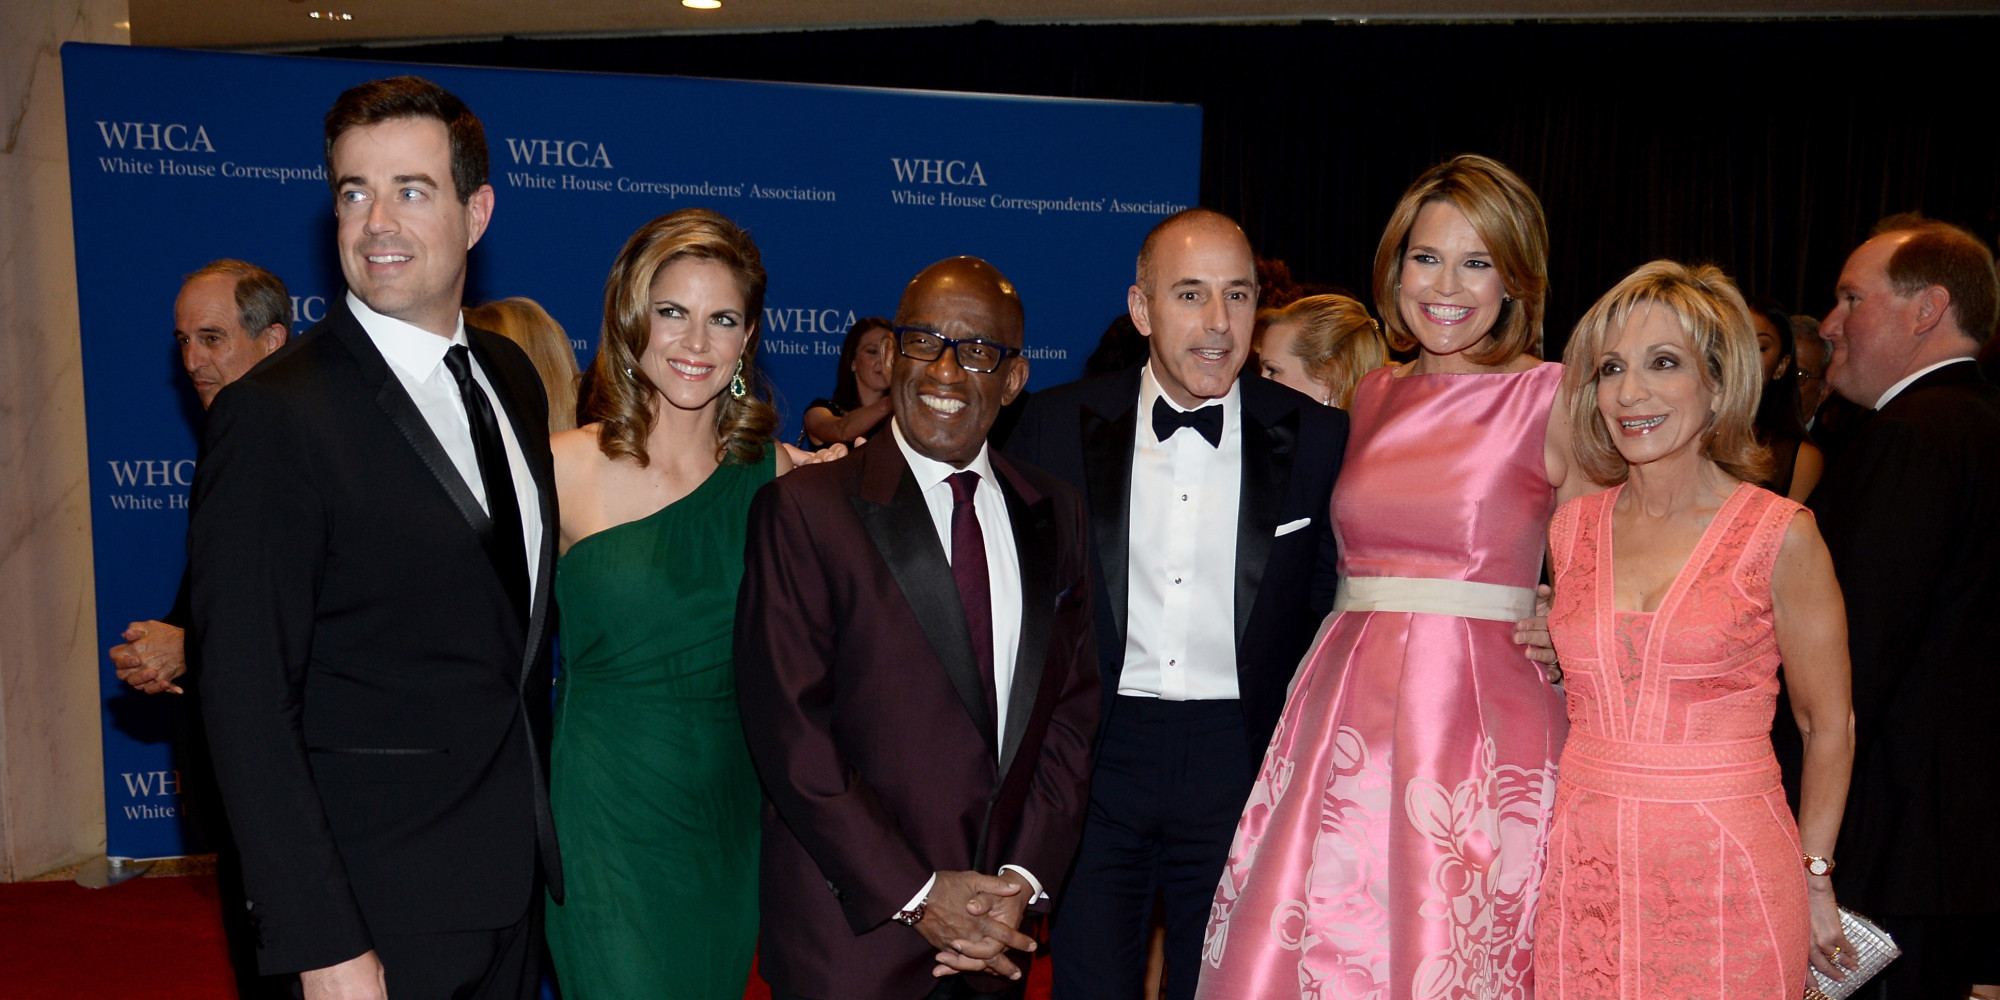 Fashion week House white correspondents association dinner for woman